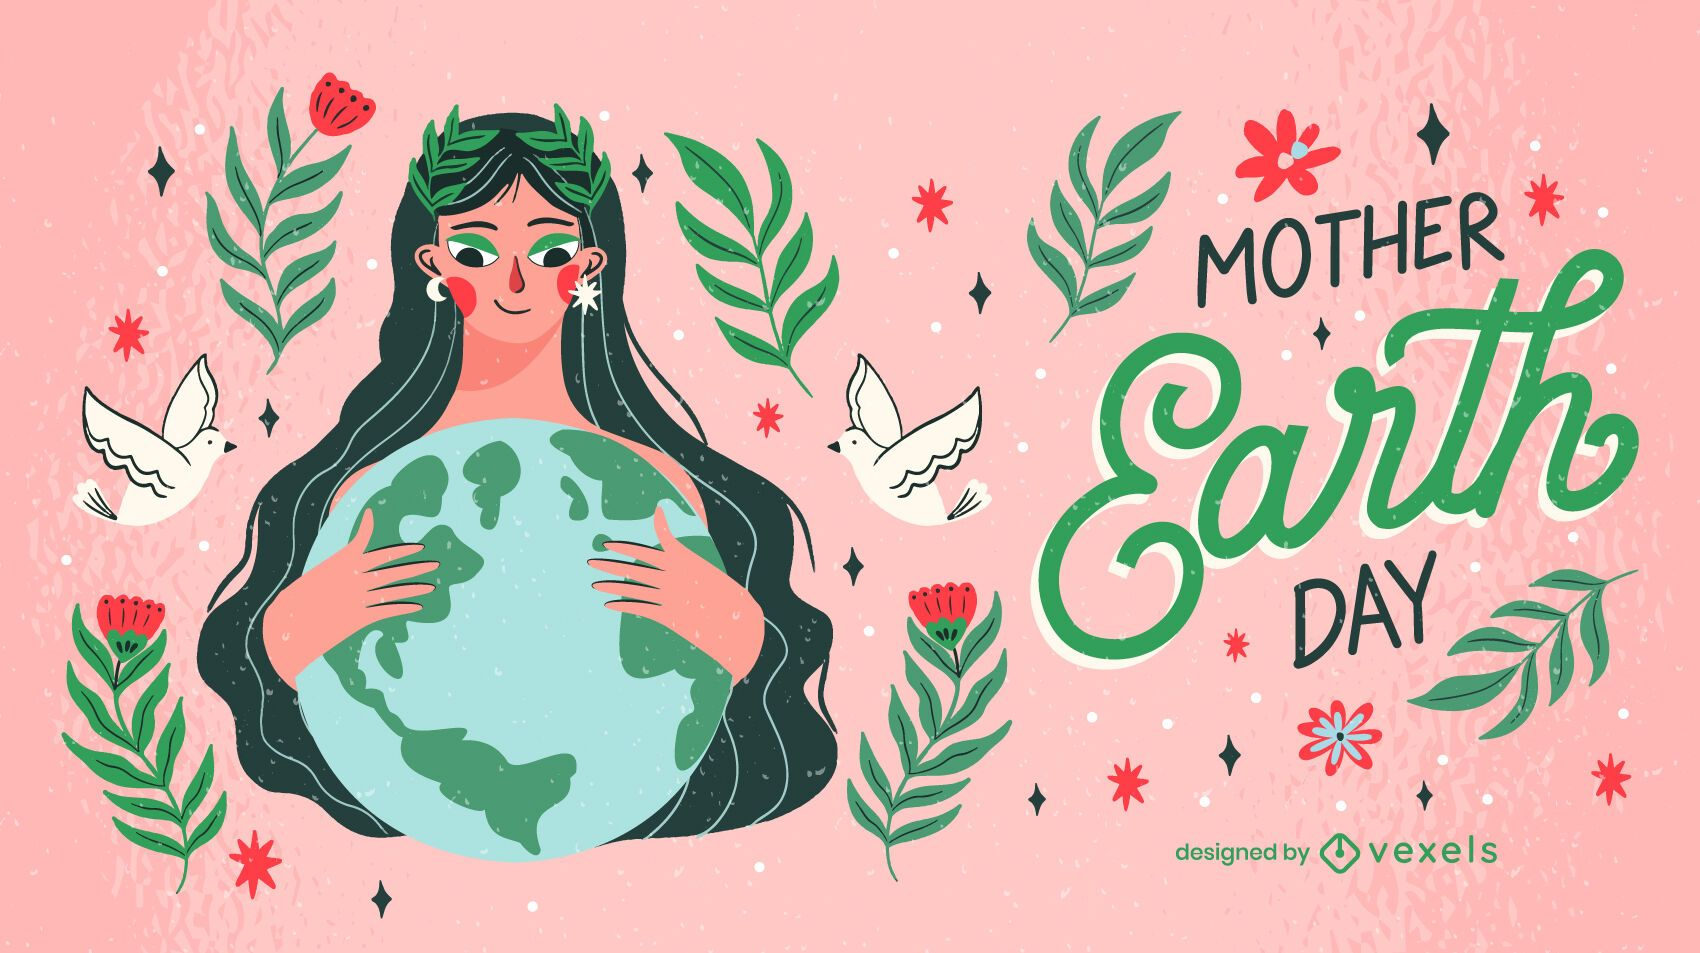 Mother earth day illustration design